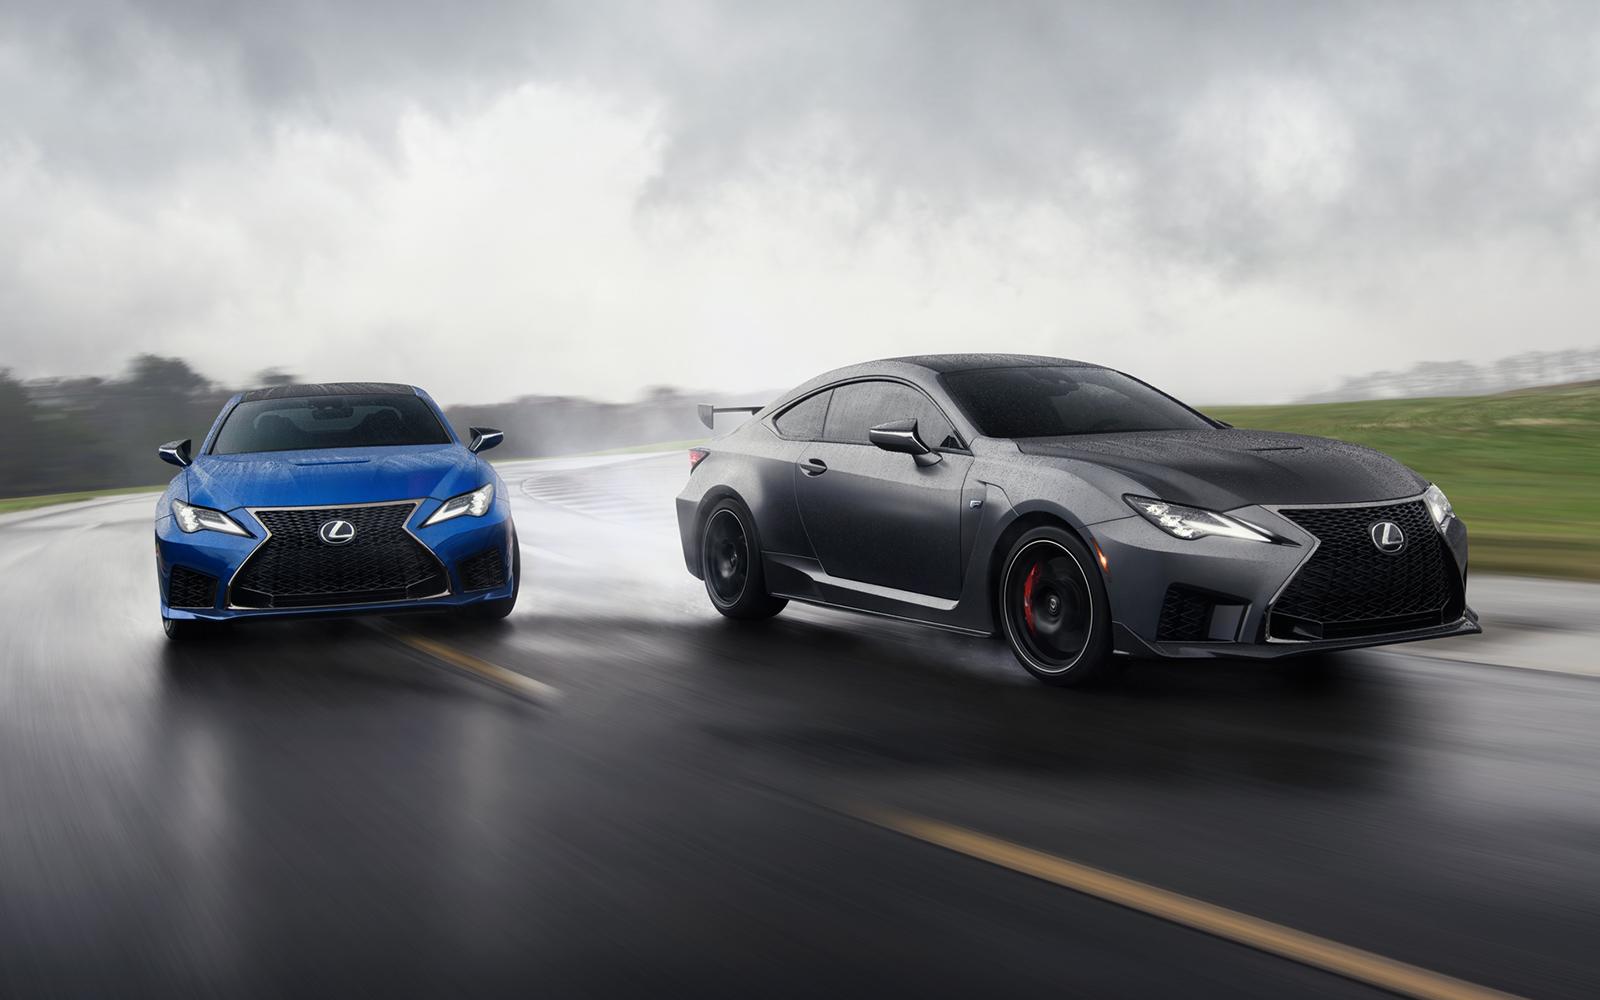 Lexus 2020 Rcf Base Ultrasonic Blue Mica 2.0 Track Matte Nebula Grey Lifestyle L